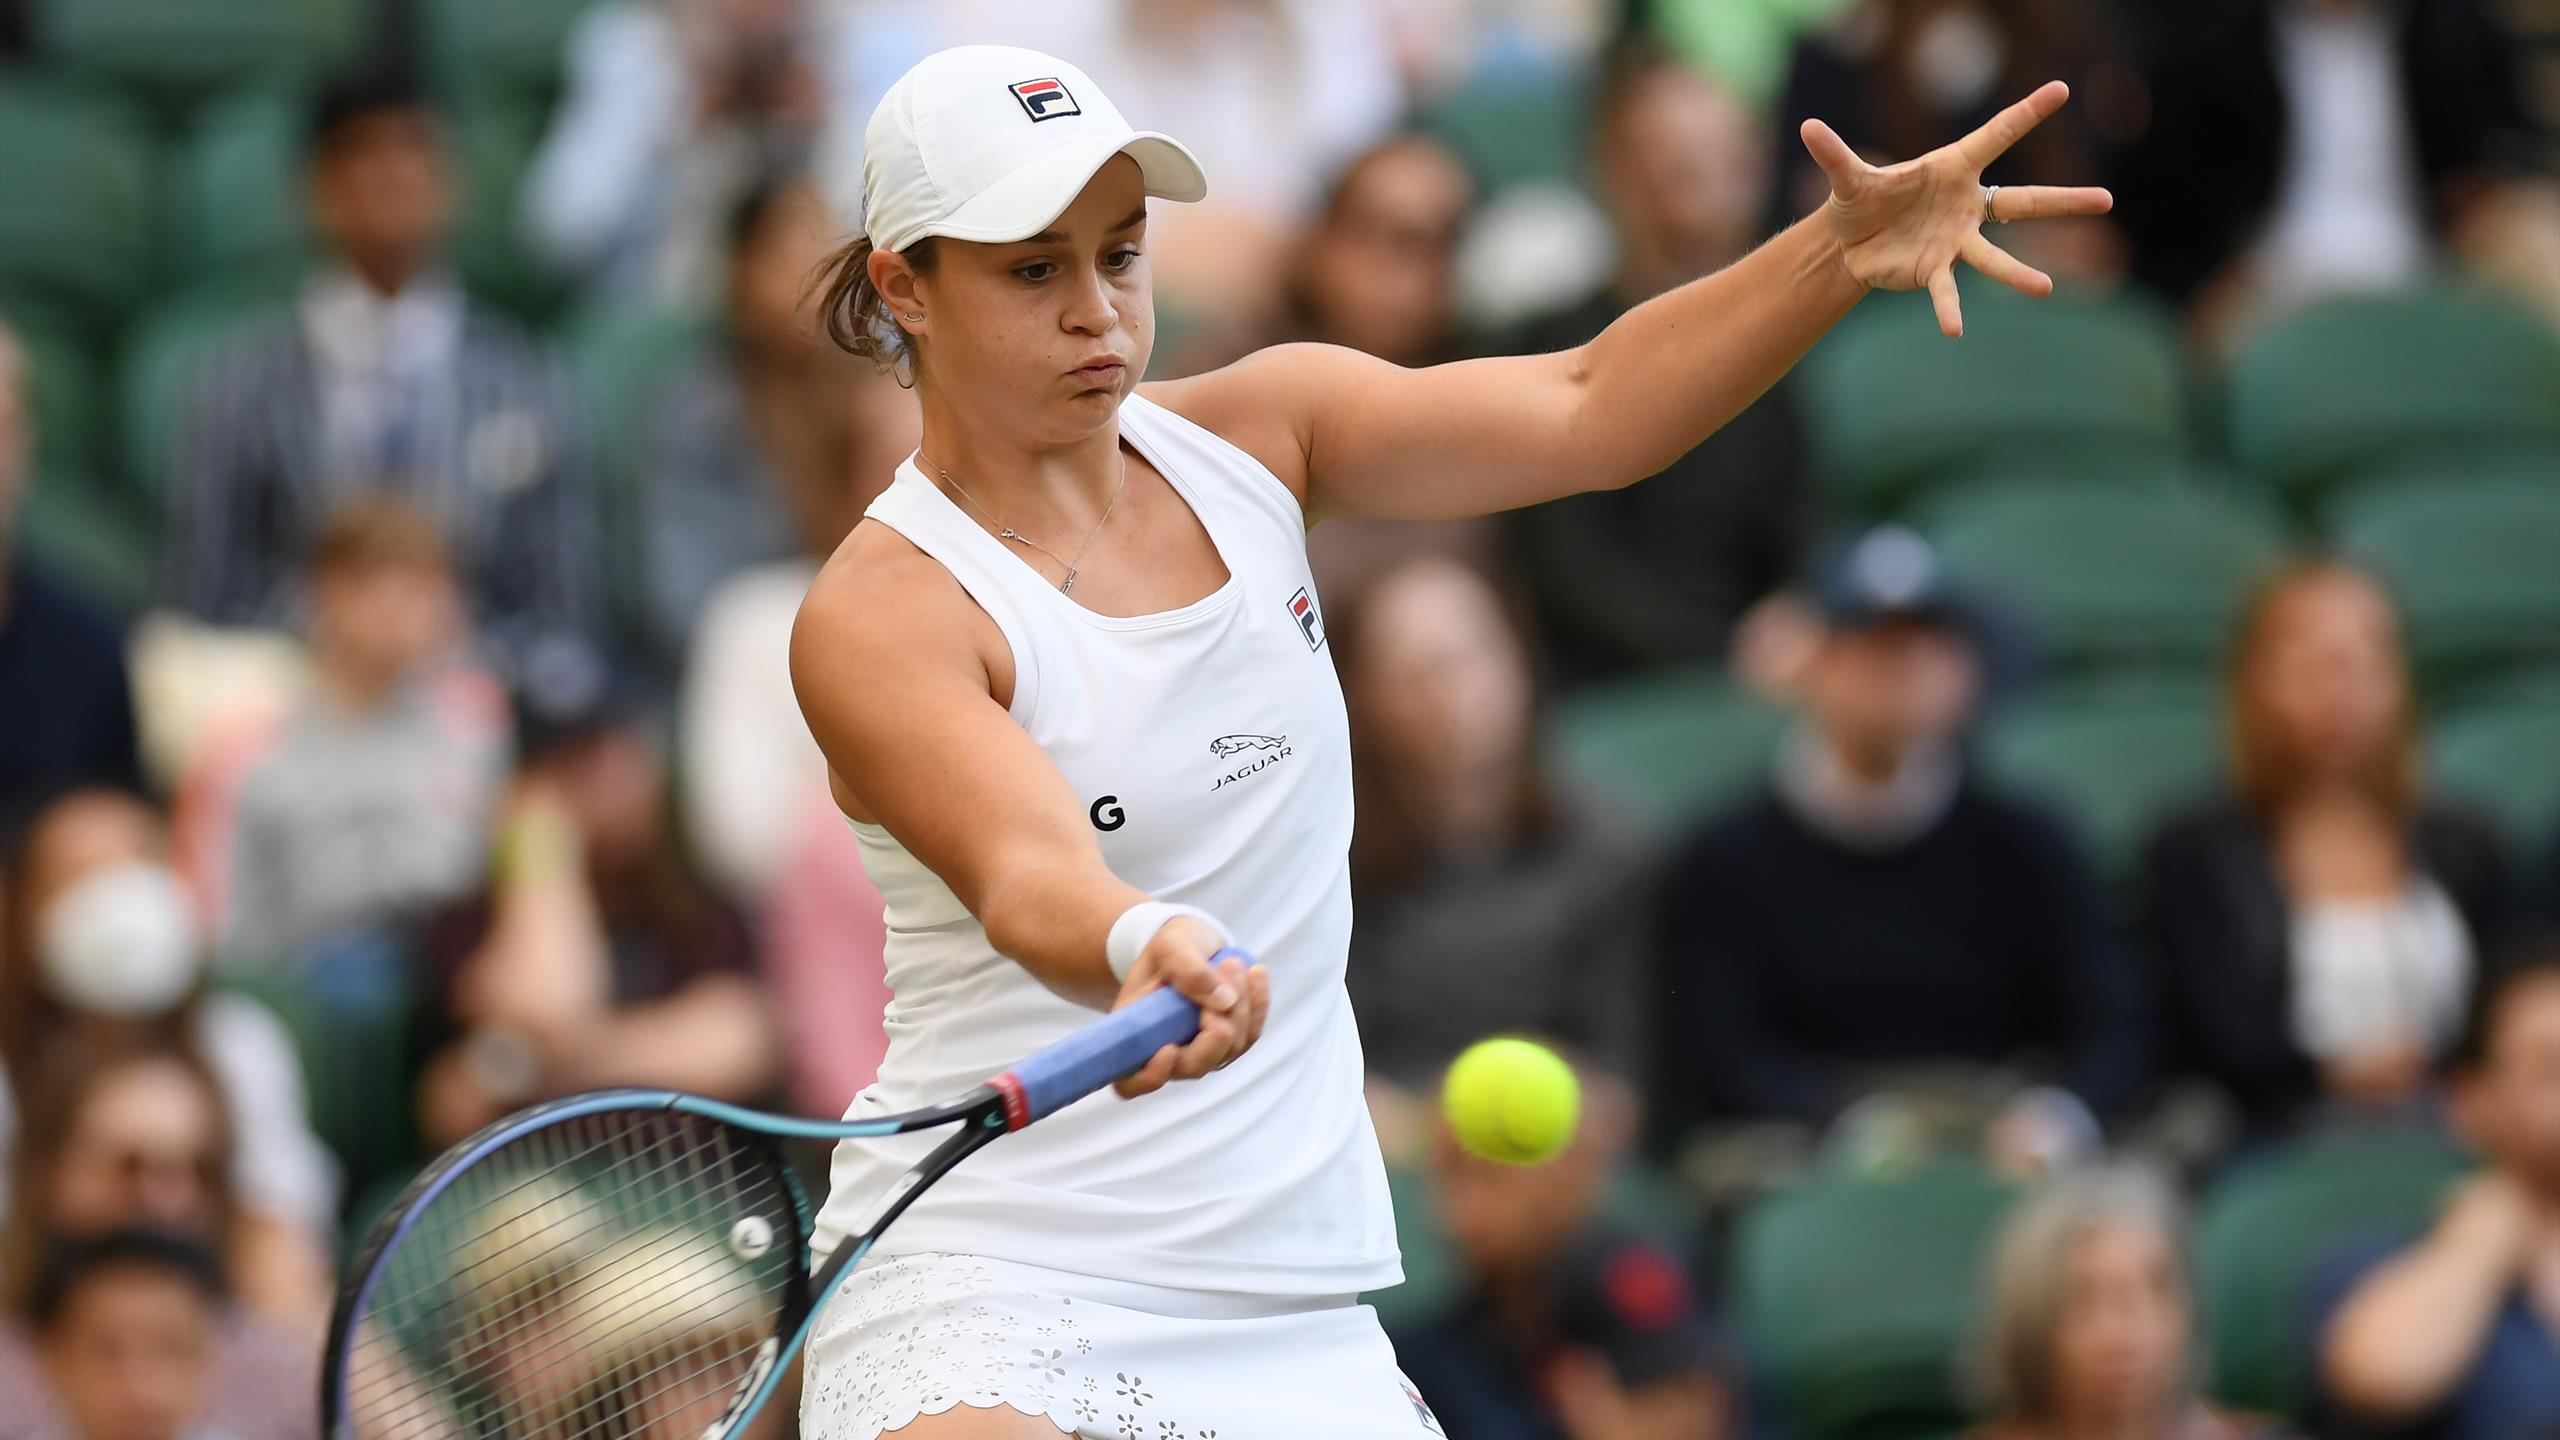 Wimbledon order of play, day eight - Ashleigh Barty, Aryna Sabalenka, Daniil Medvedev in action